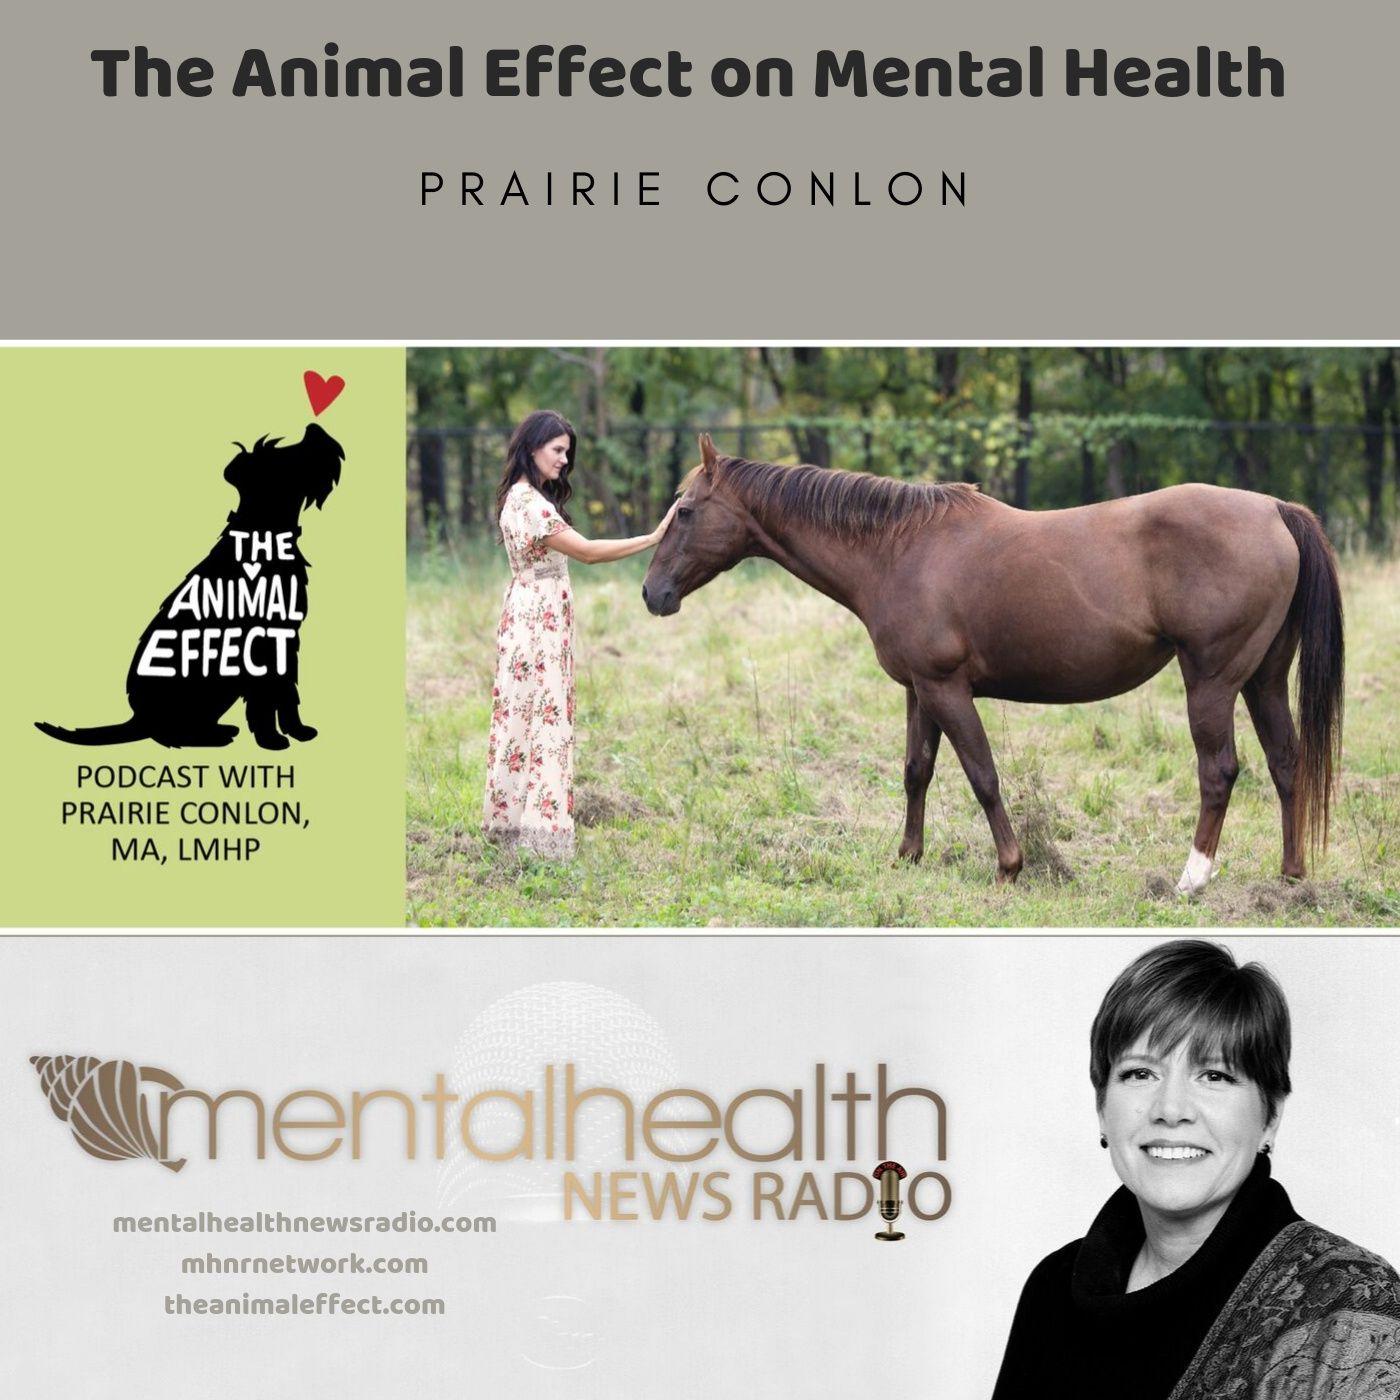 Mental Health News Radio - The Animal Effect on Mental Health with Prairie Conlon